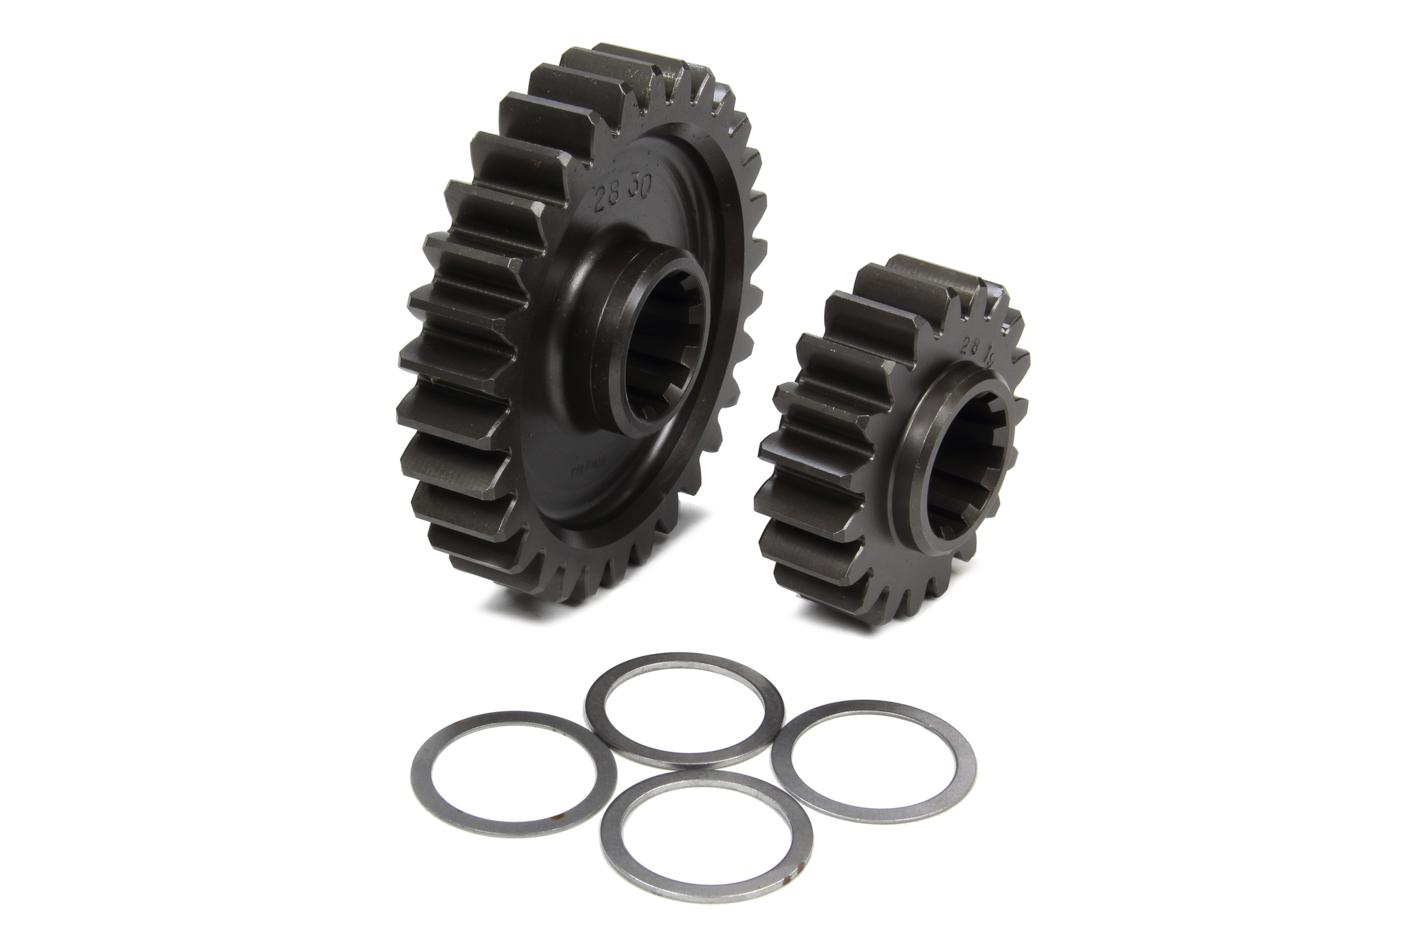 Coleman Machine 207-28 Quick Change Gear Set, Pro-Lite, Set 28, 10 Spline, 4.11 Ratio 6.49 / 2.60, 4.86 Ratio 7.68 / 3.08, Steel, Each